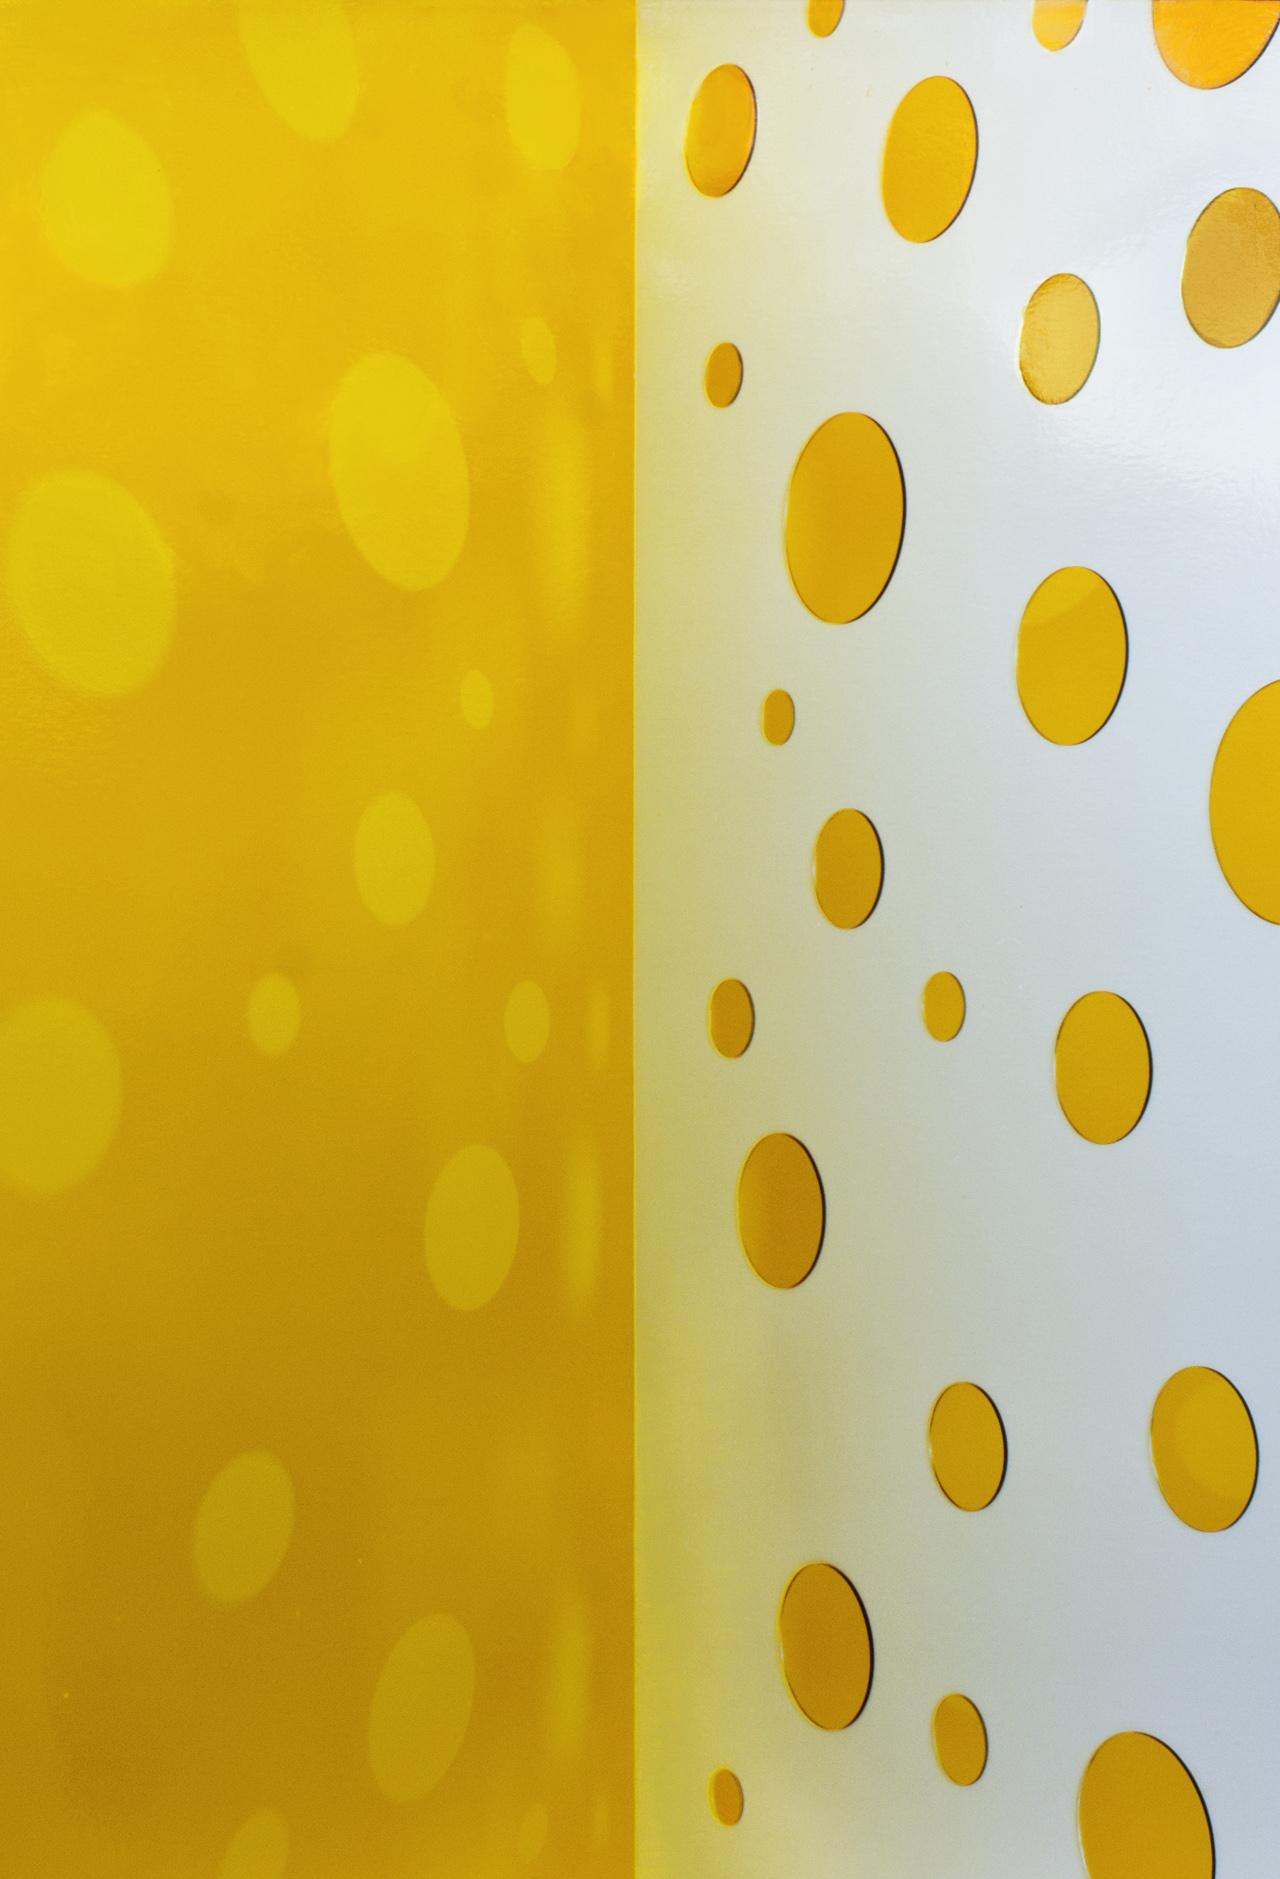 ©Jacky Redgate Light Throw (Mirrors) - Yellow and White, 2019 LR.jpg